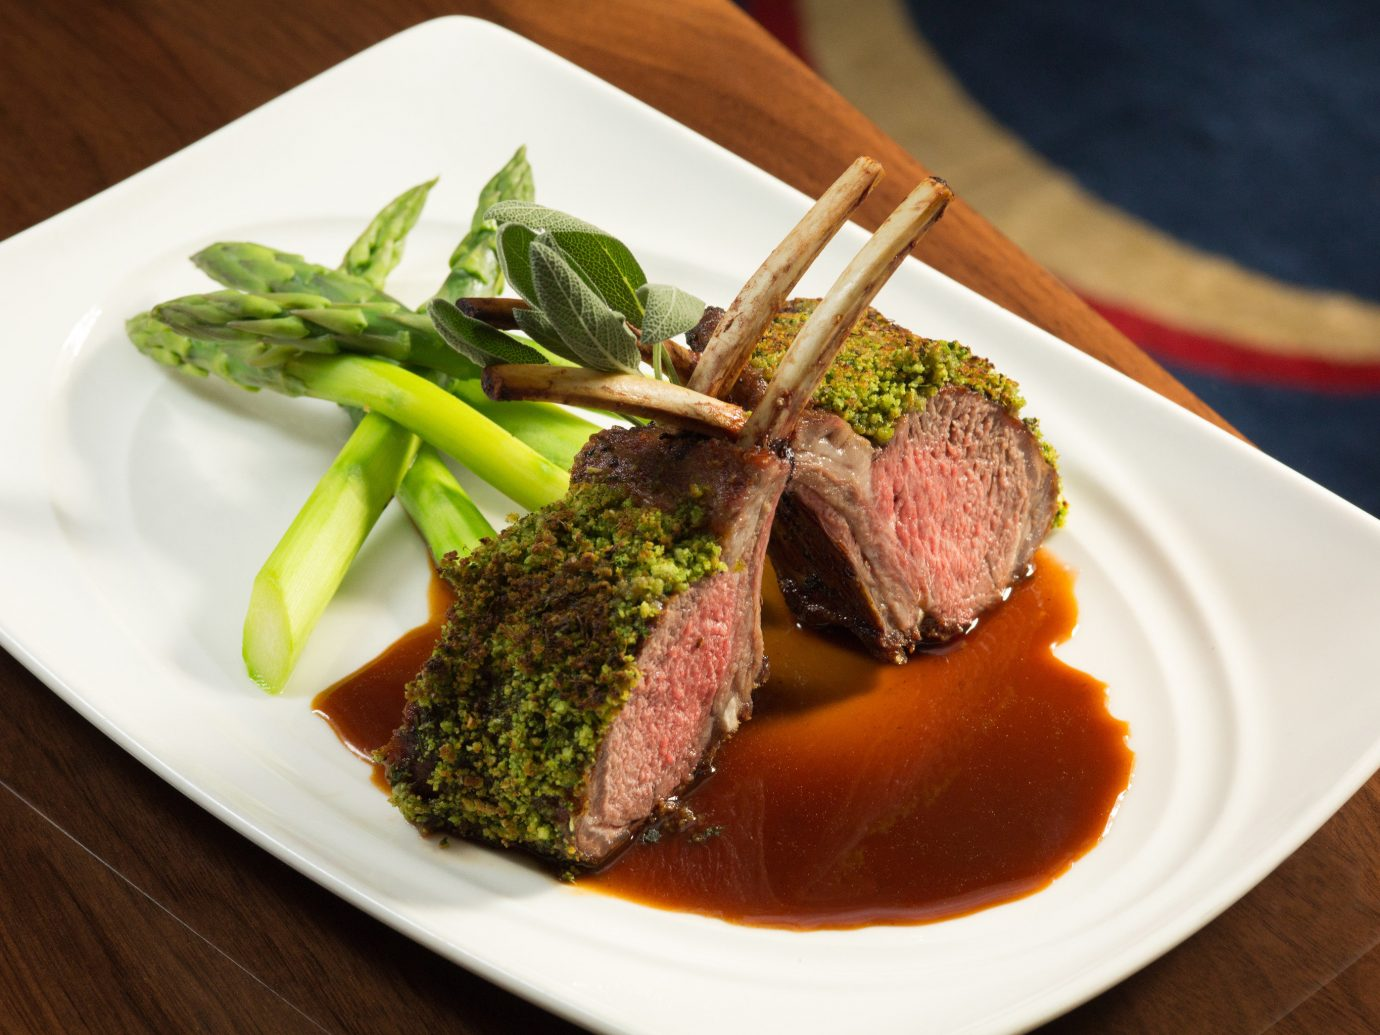 Food + Drink plate table food dish meat cuisine produce meal steak vegetable piece de resistance